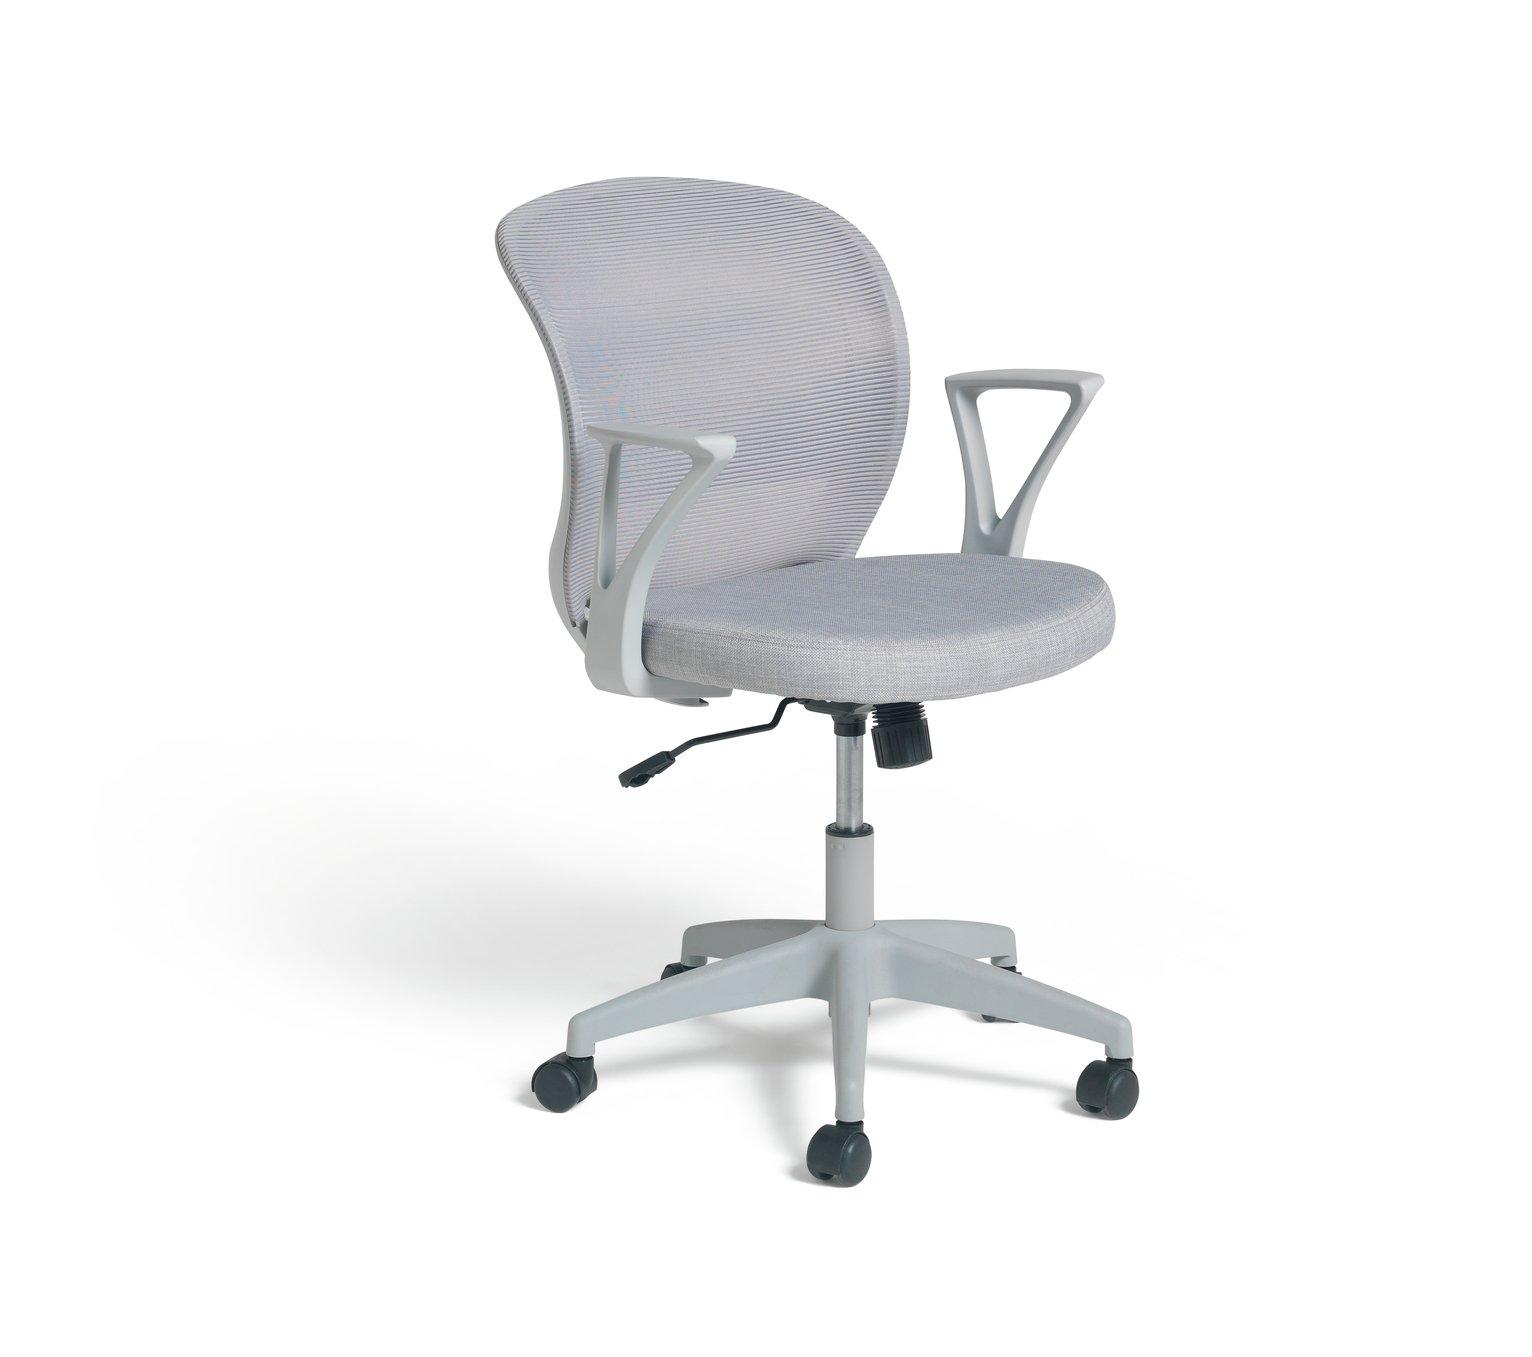 Habitat Beck Mesh Office Chair - Grey